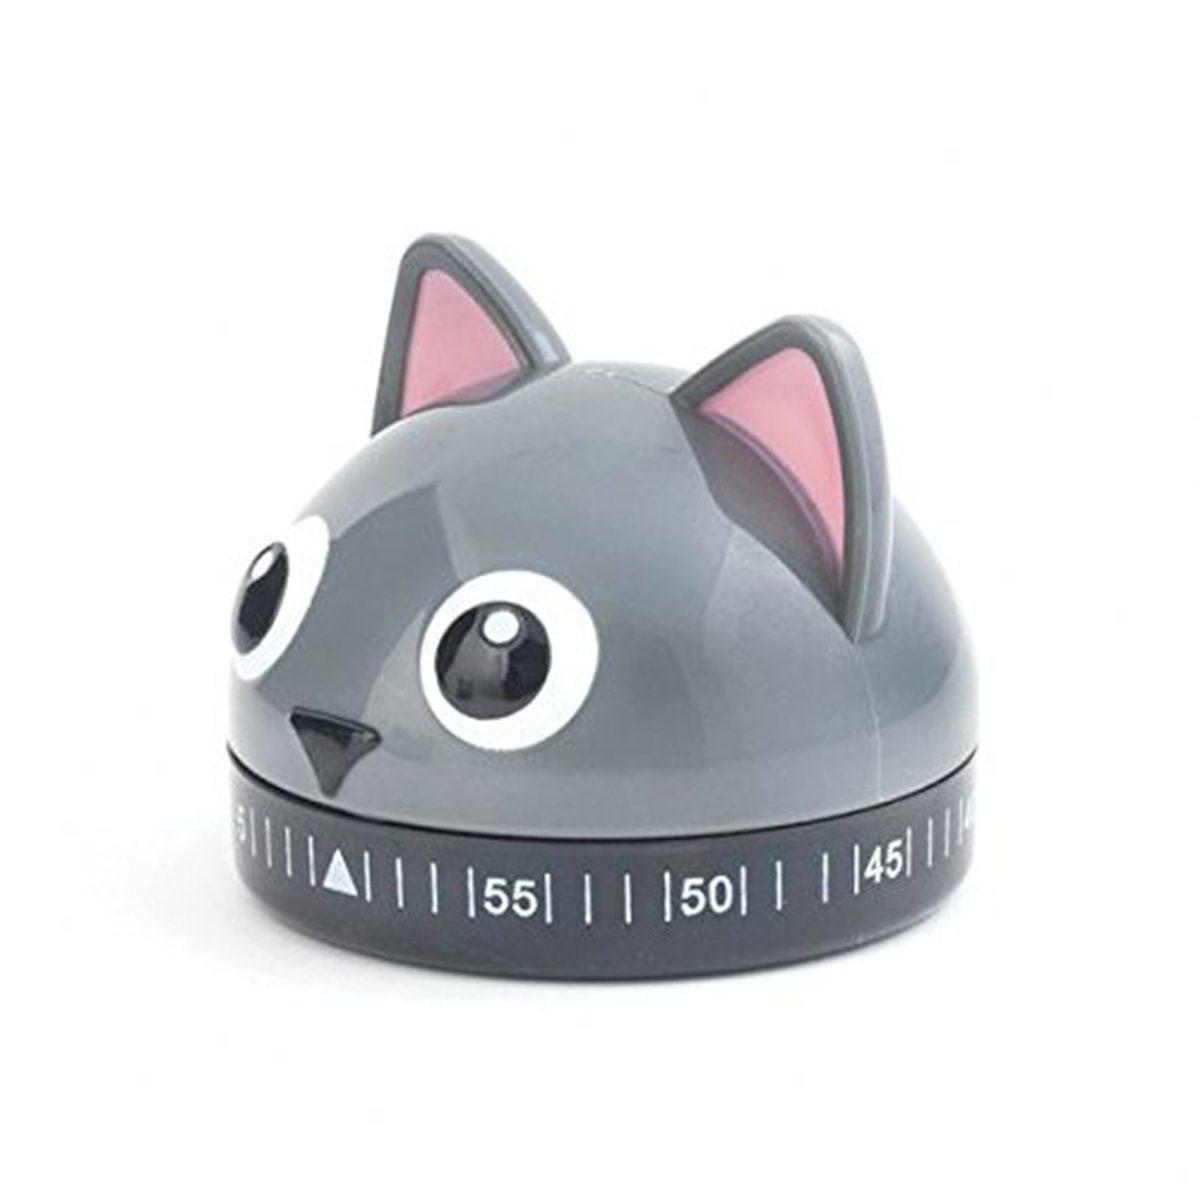 Kikkerland cat timer